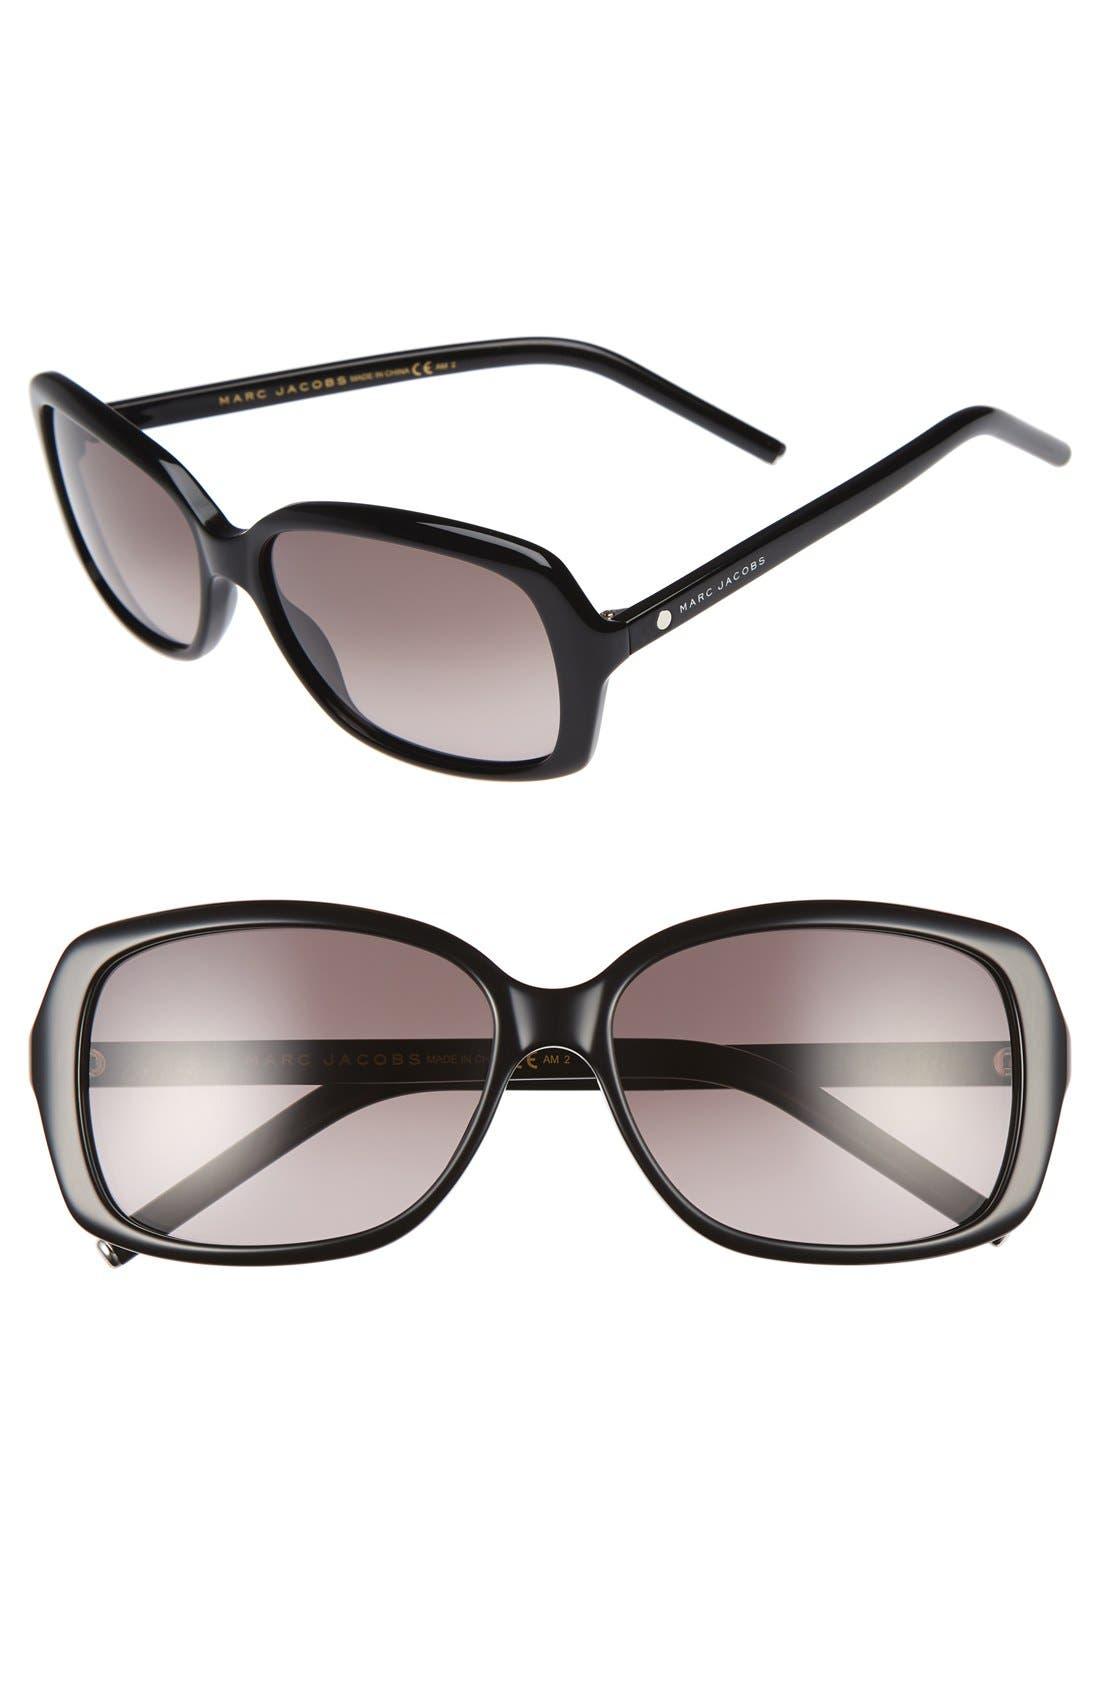 MARC JACOBS 57mm Sunglasses,                             Main thumbnail 1, color,                             002